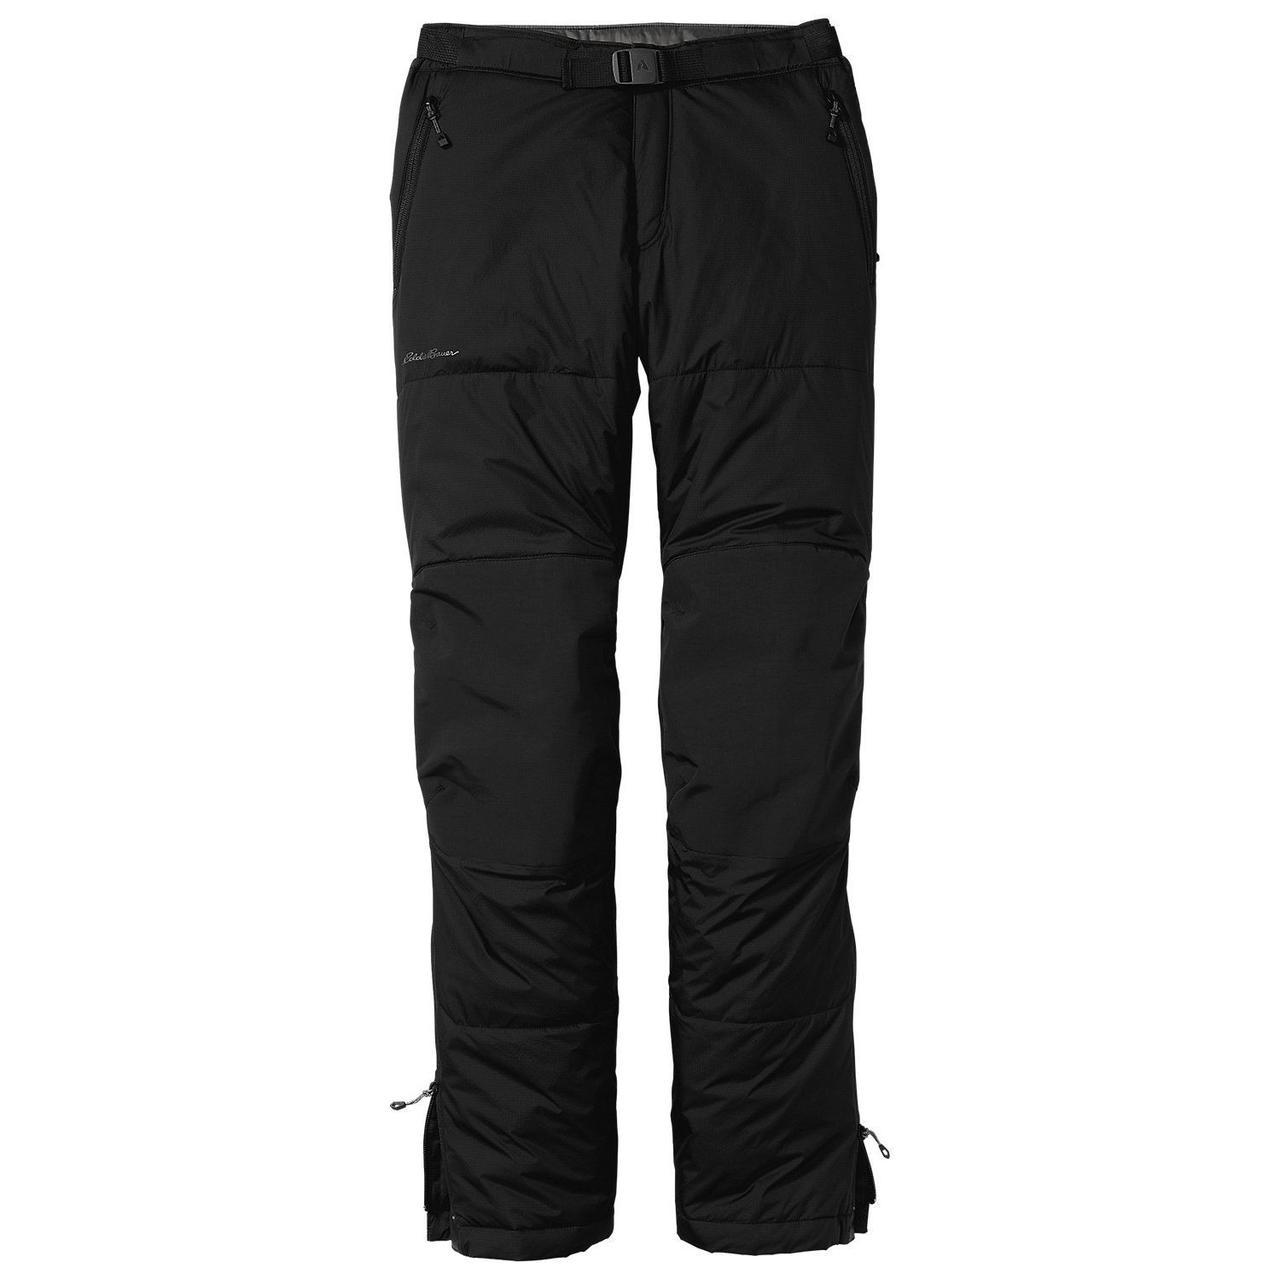 Спортивные штаны женские  Eddie Bauer Women Igniter Pants BLACK